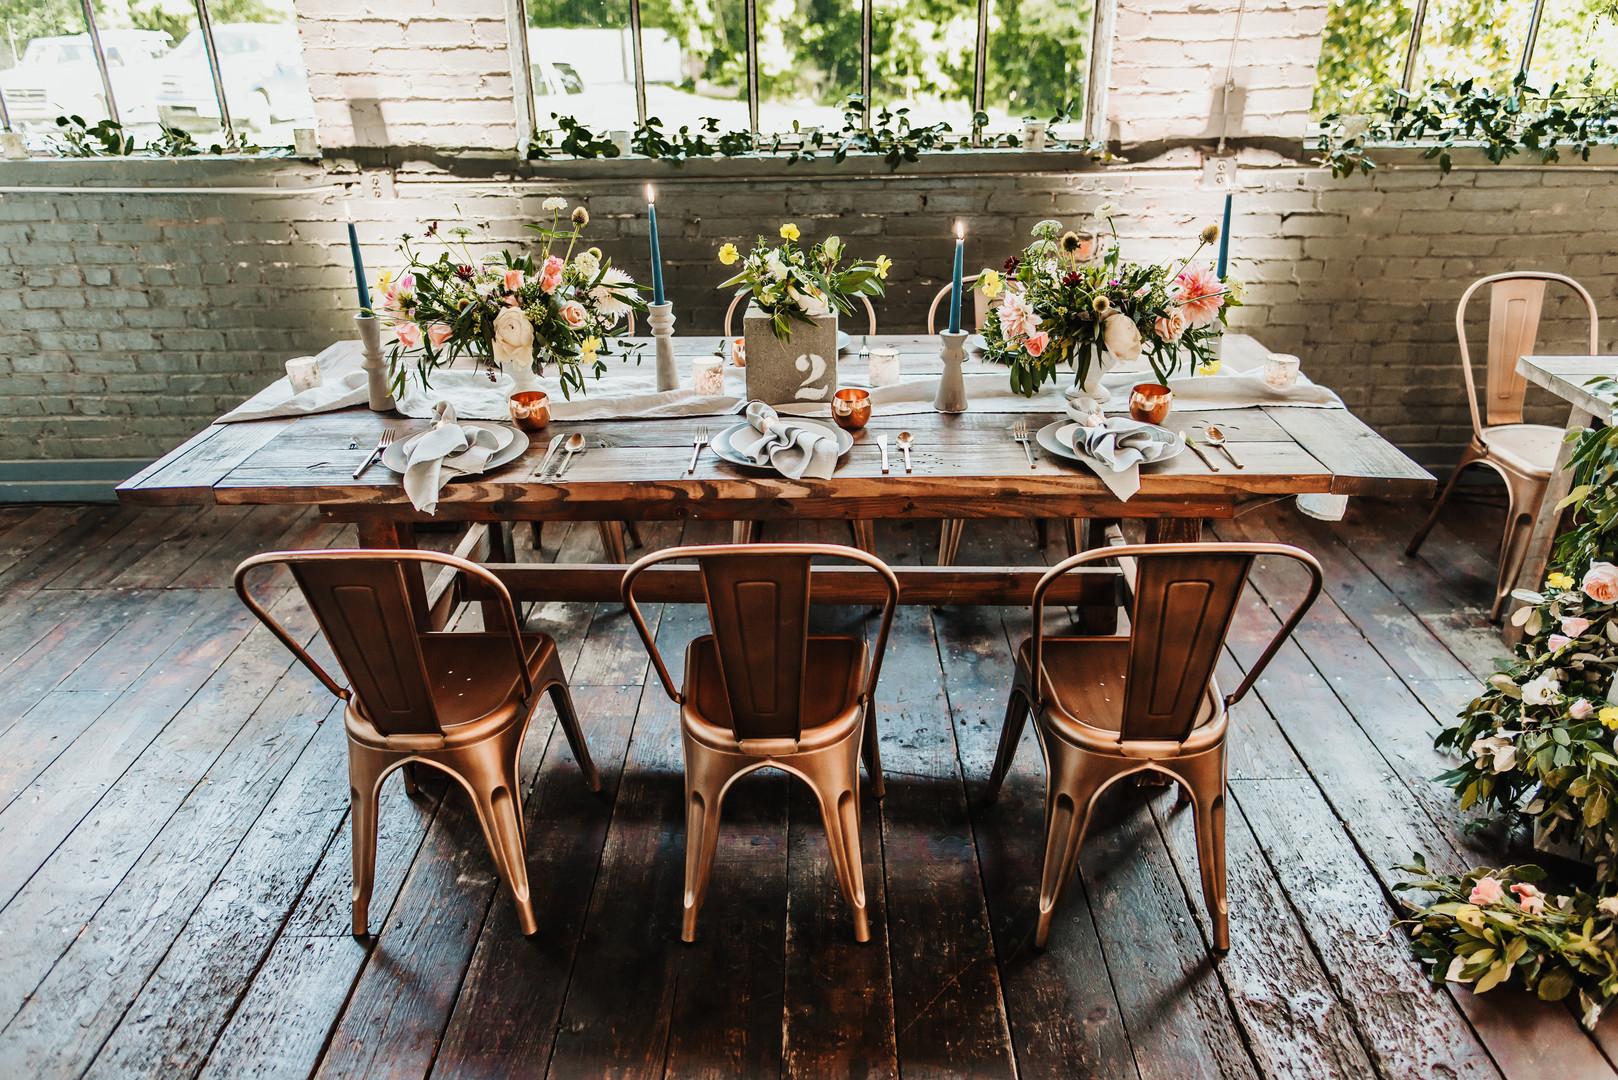 bröllop+industriellt+boho+dukning